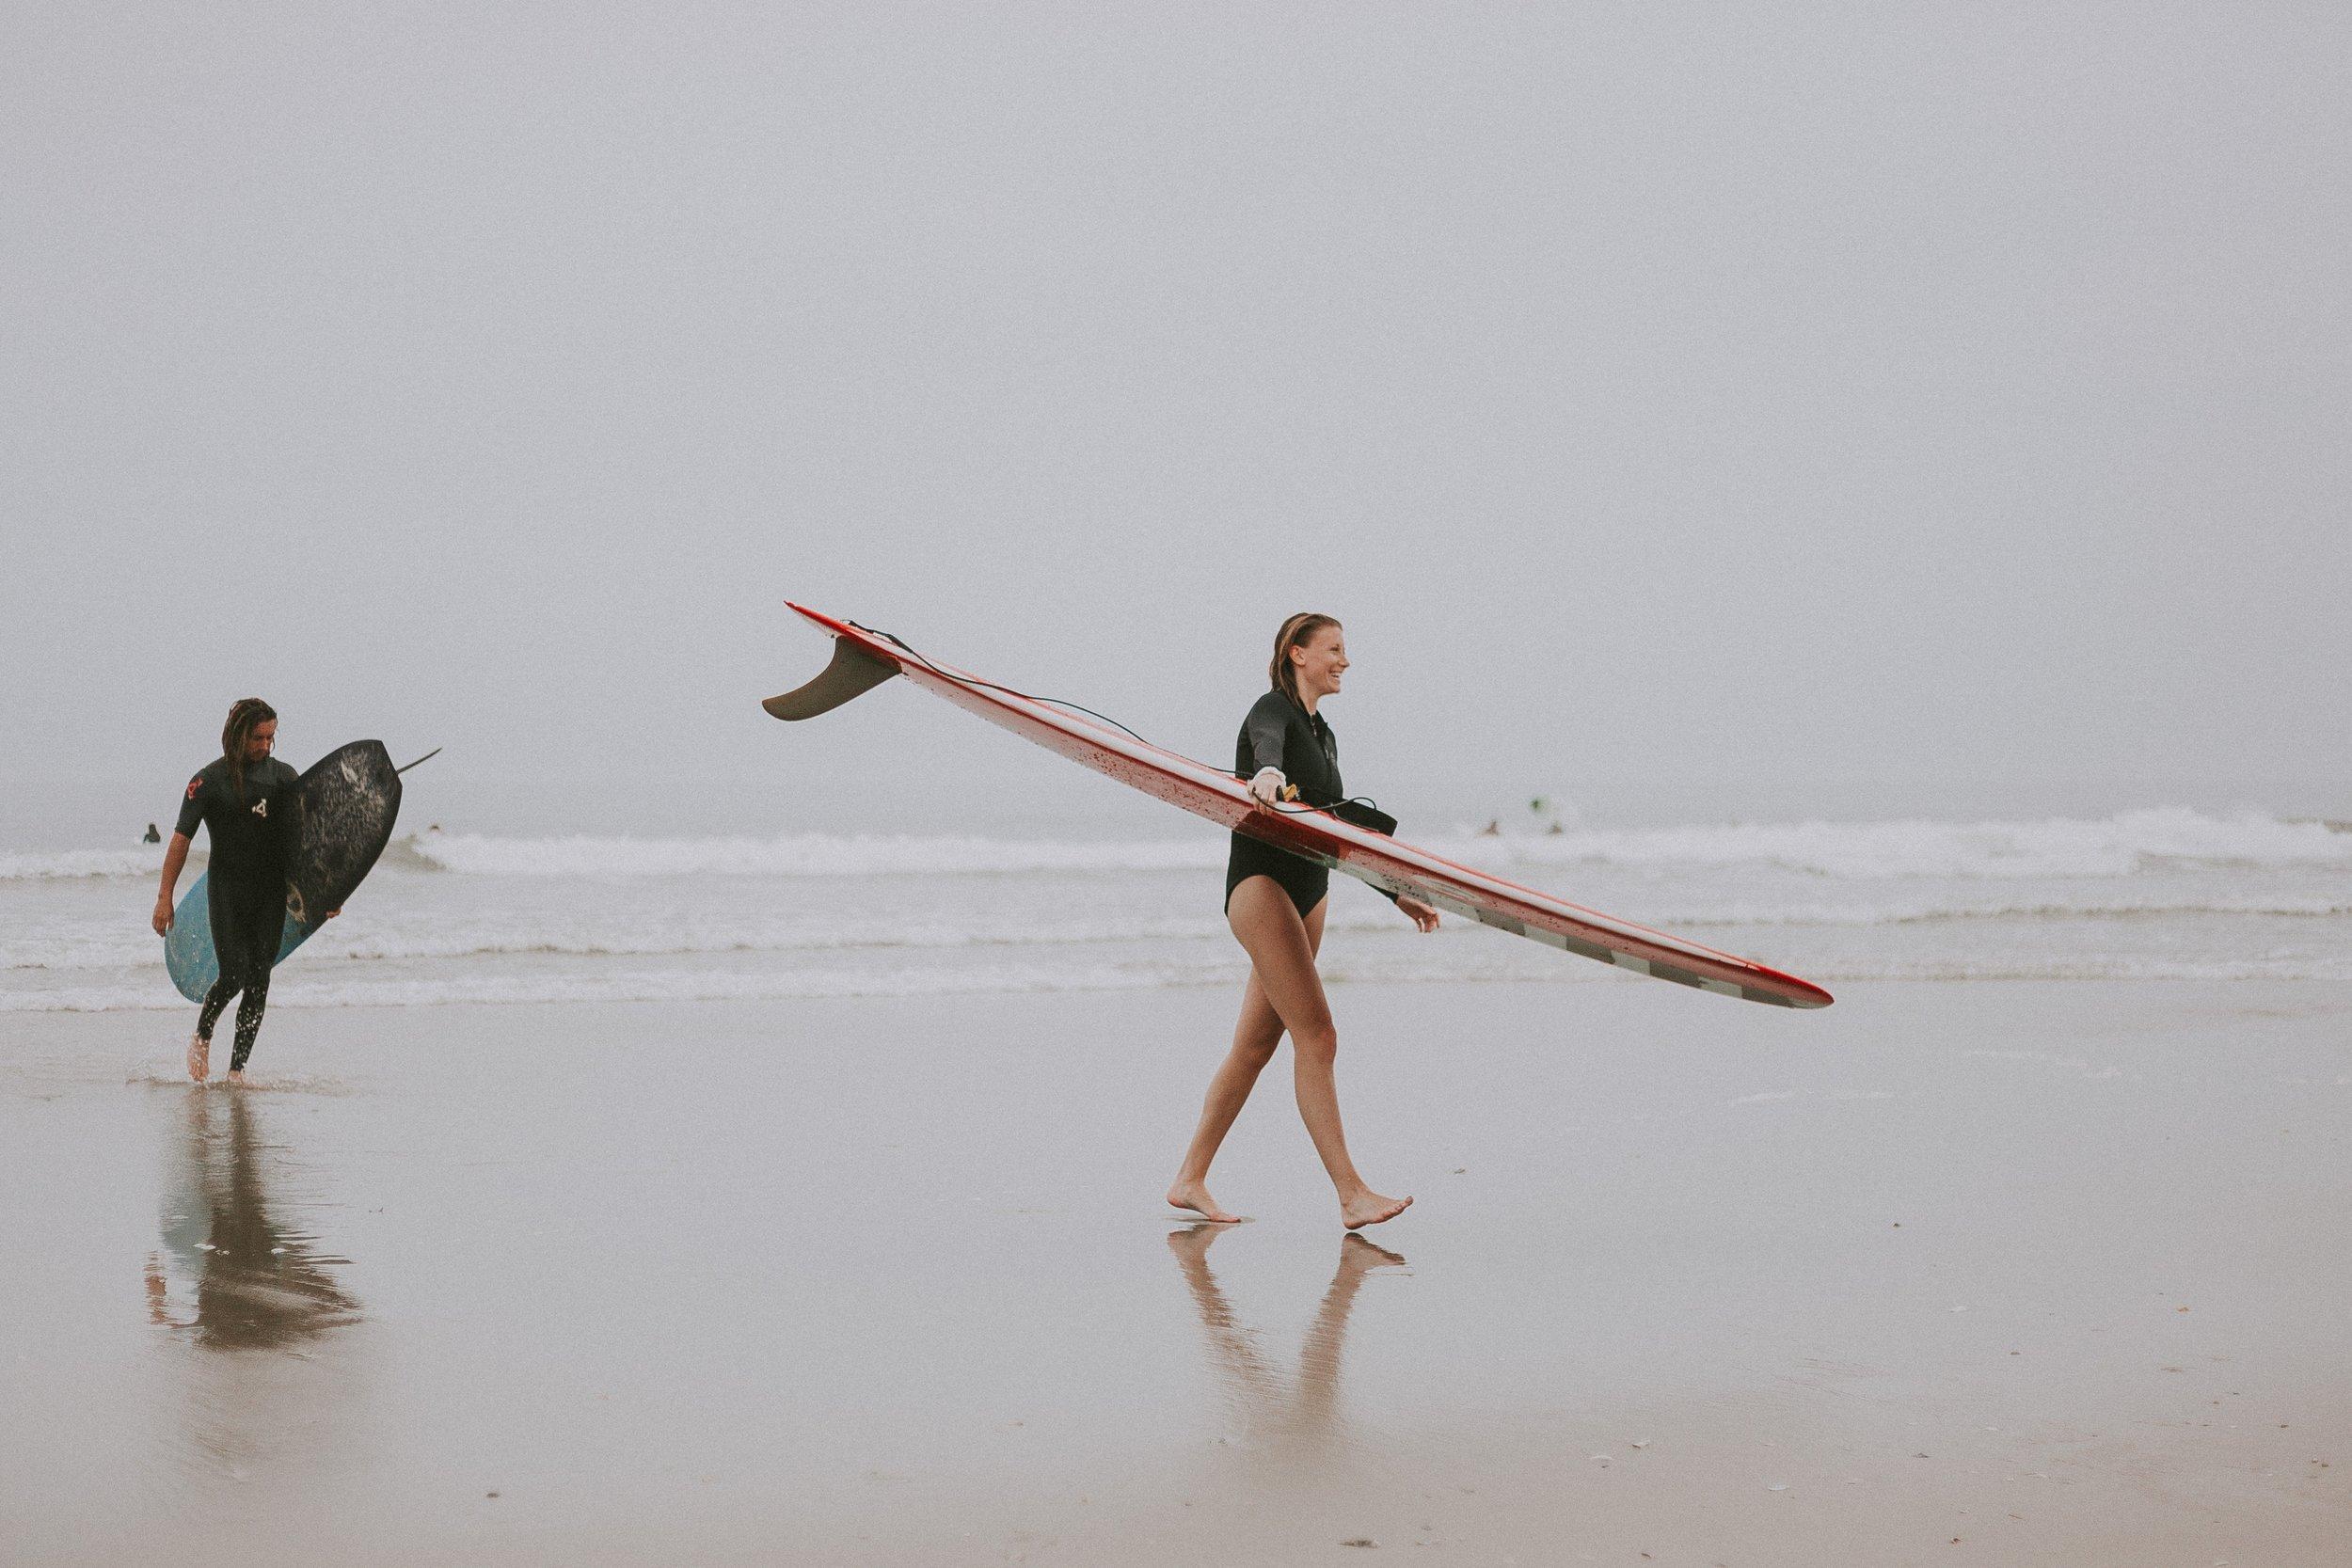 activity-beach-female-1236685.jpg